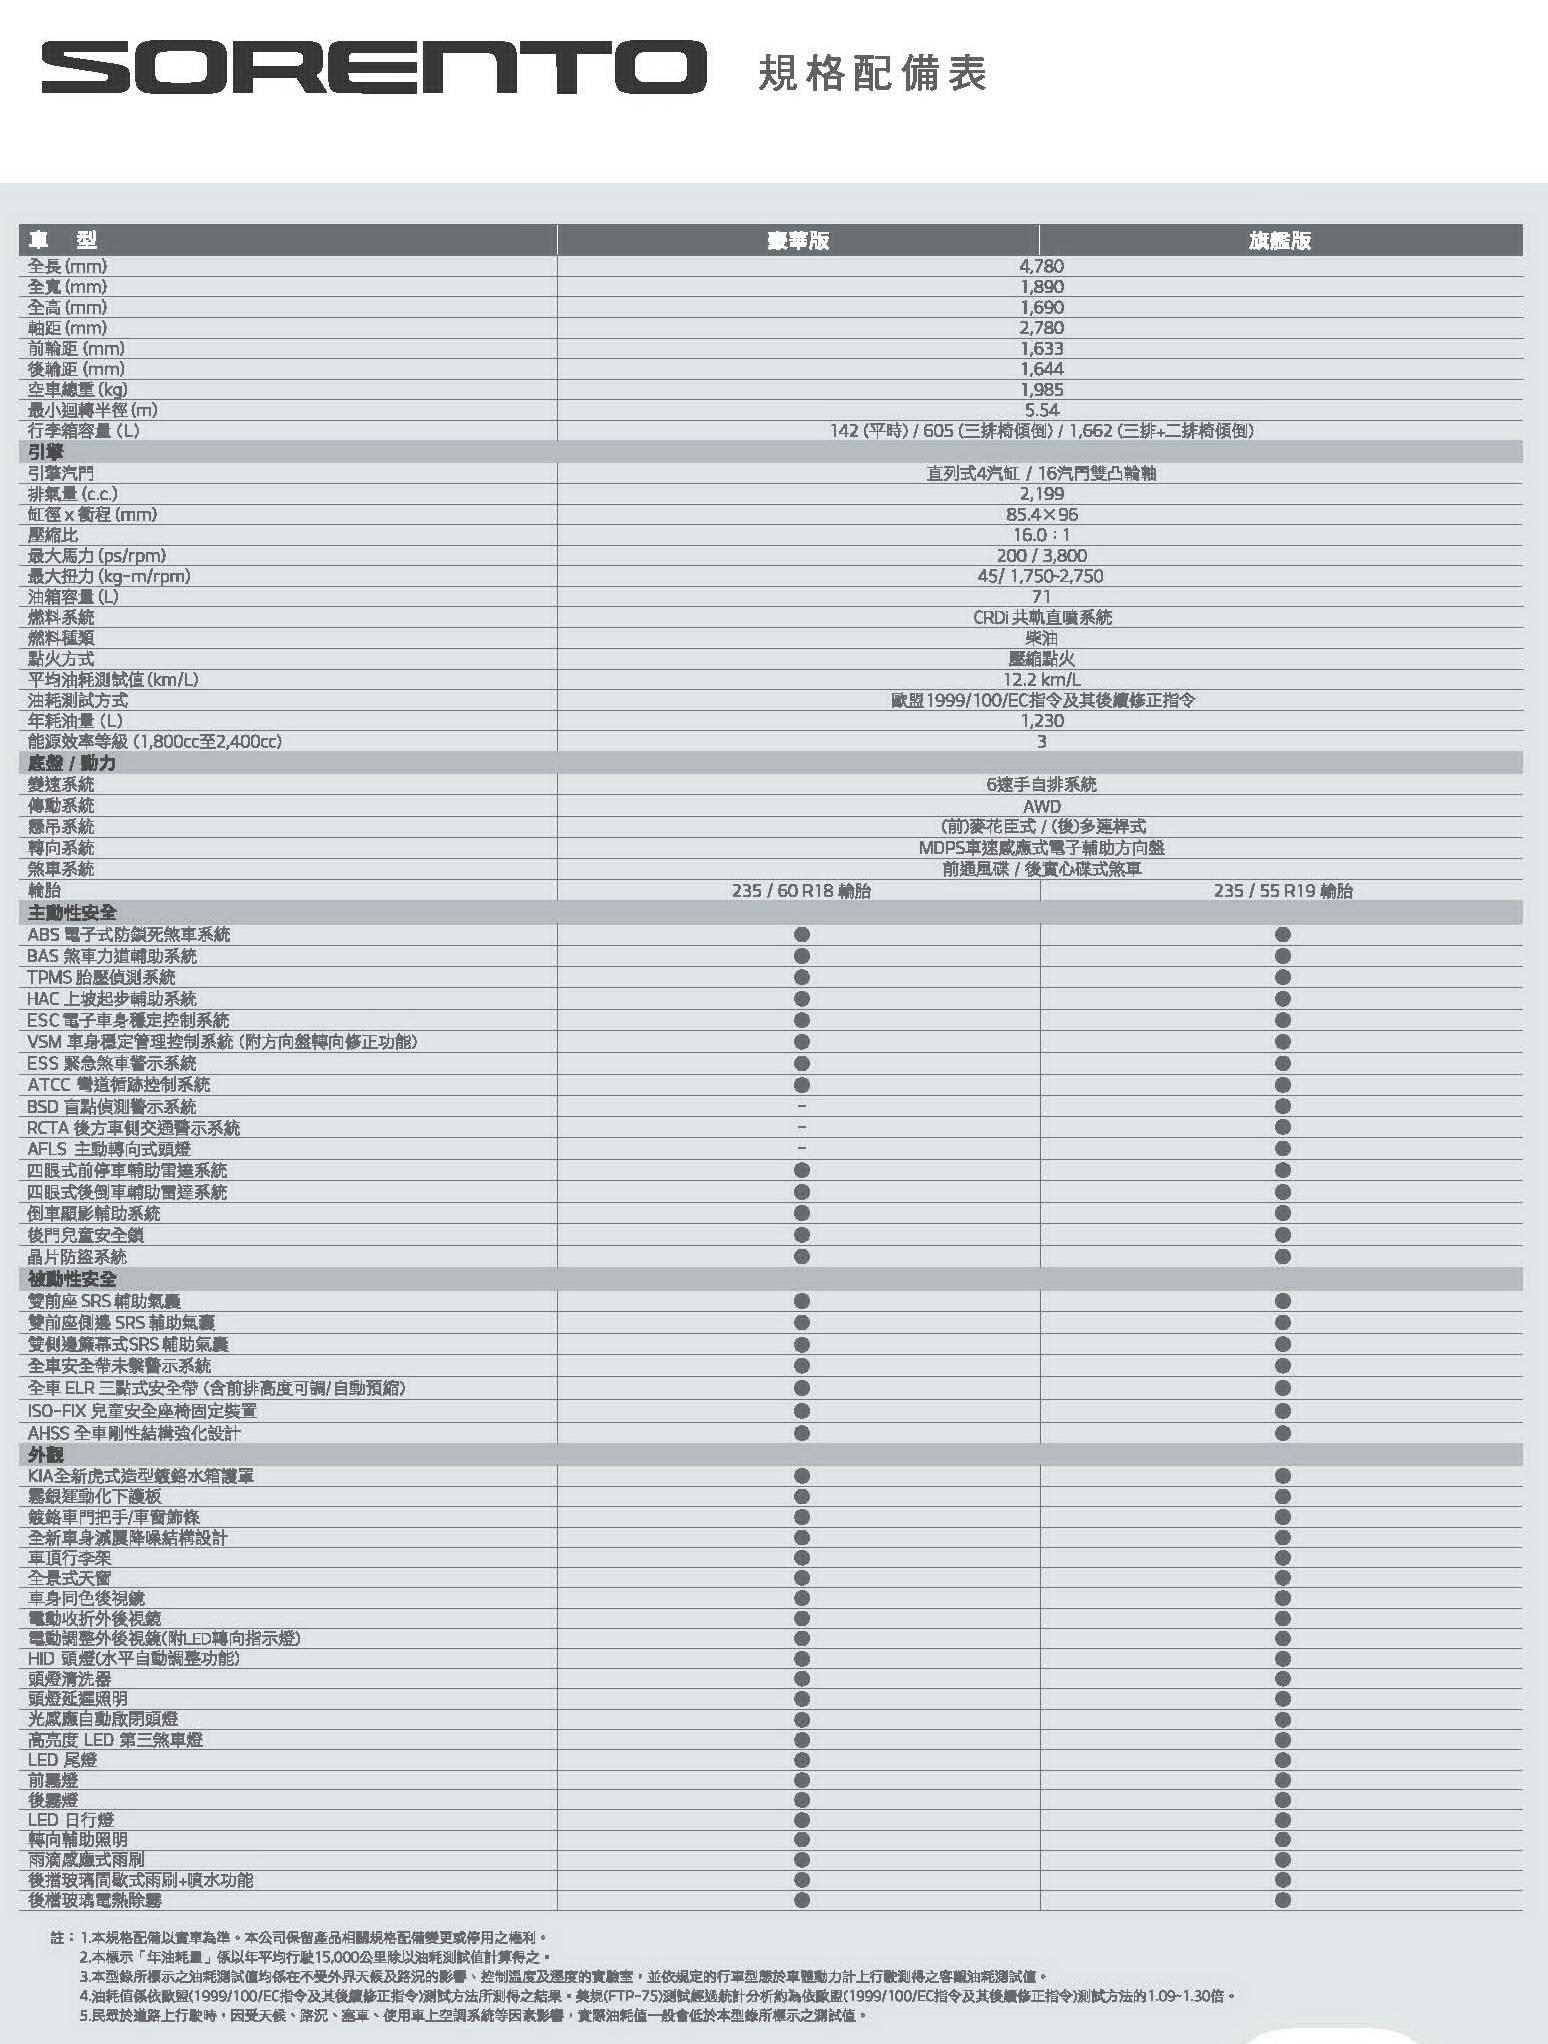 Sorento規格配備表_頁面_1